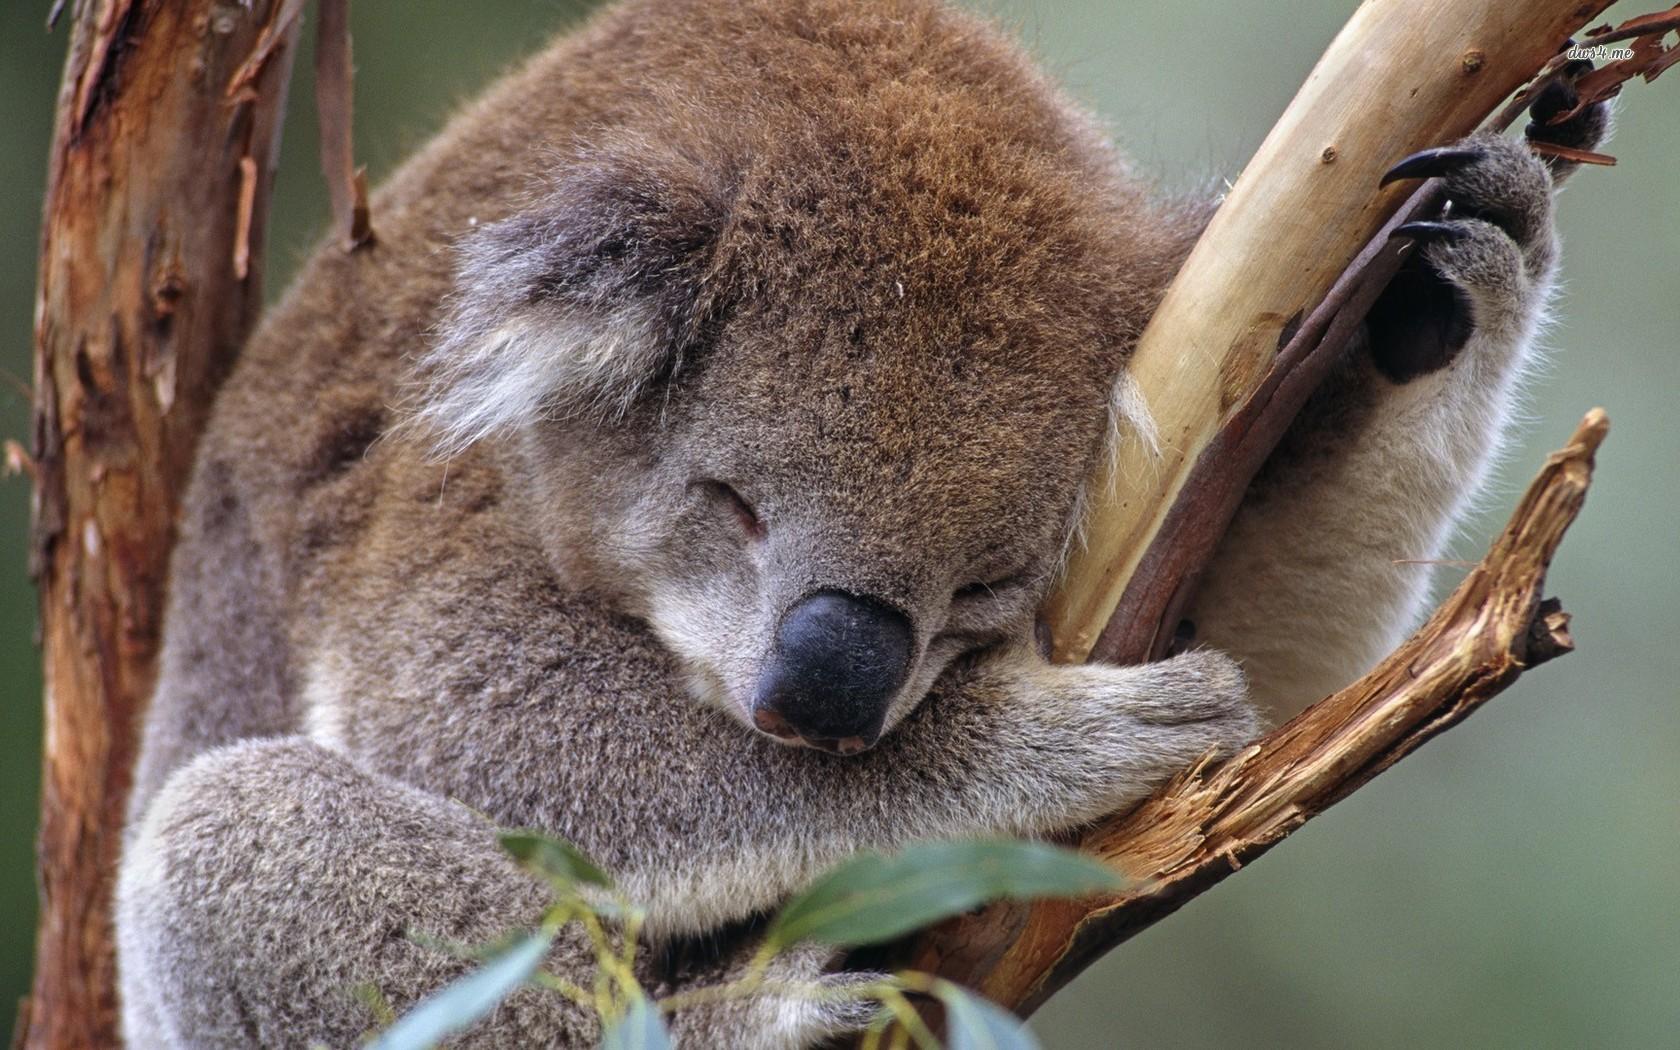 10560-sleeping-koala-1680x1050-animal-wallpaper